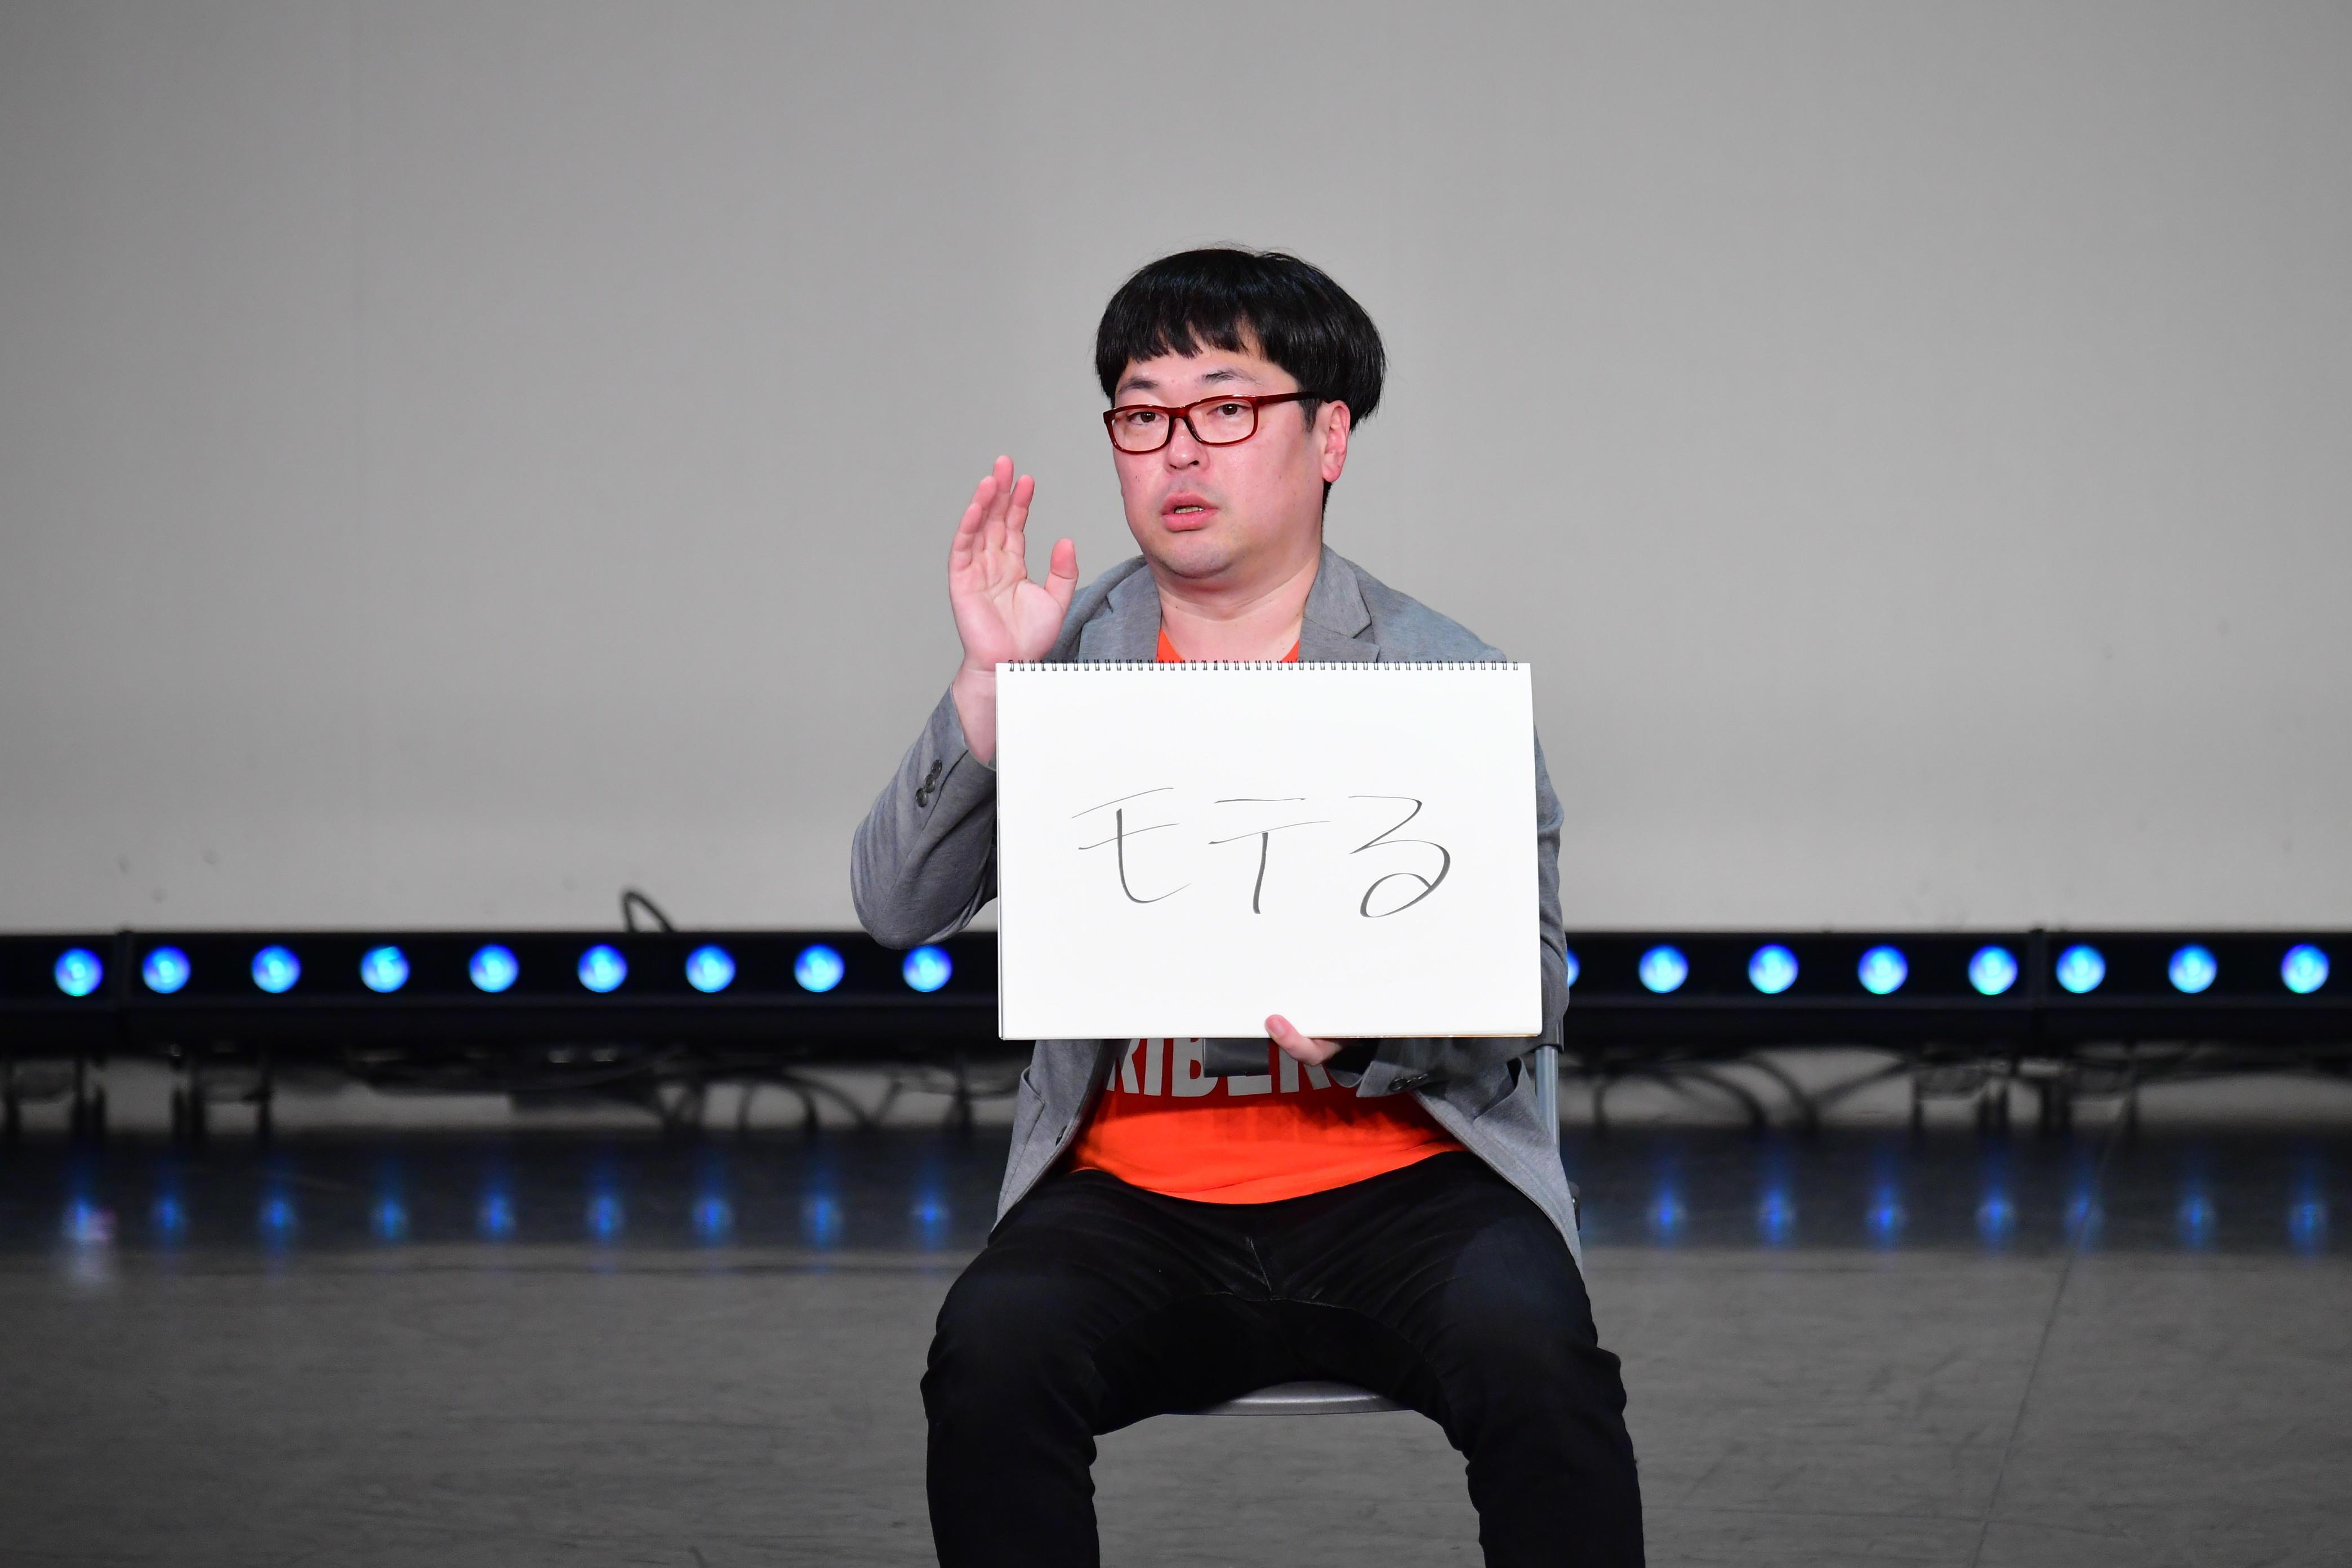 http://news.yoshimoto.co.jp/20190112211429-450a5b24ee7d708ebc2c7391c7aae1adb9ba6bd5.jpg